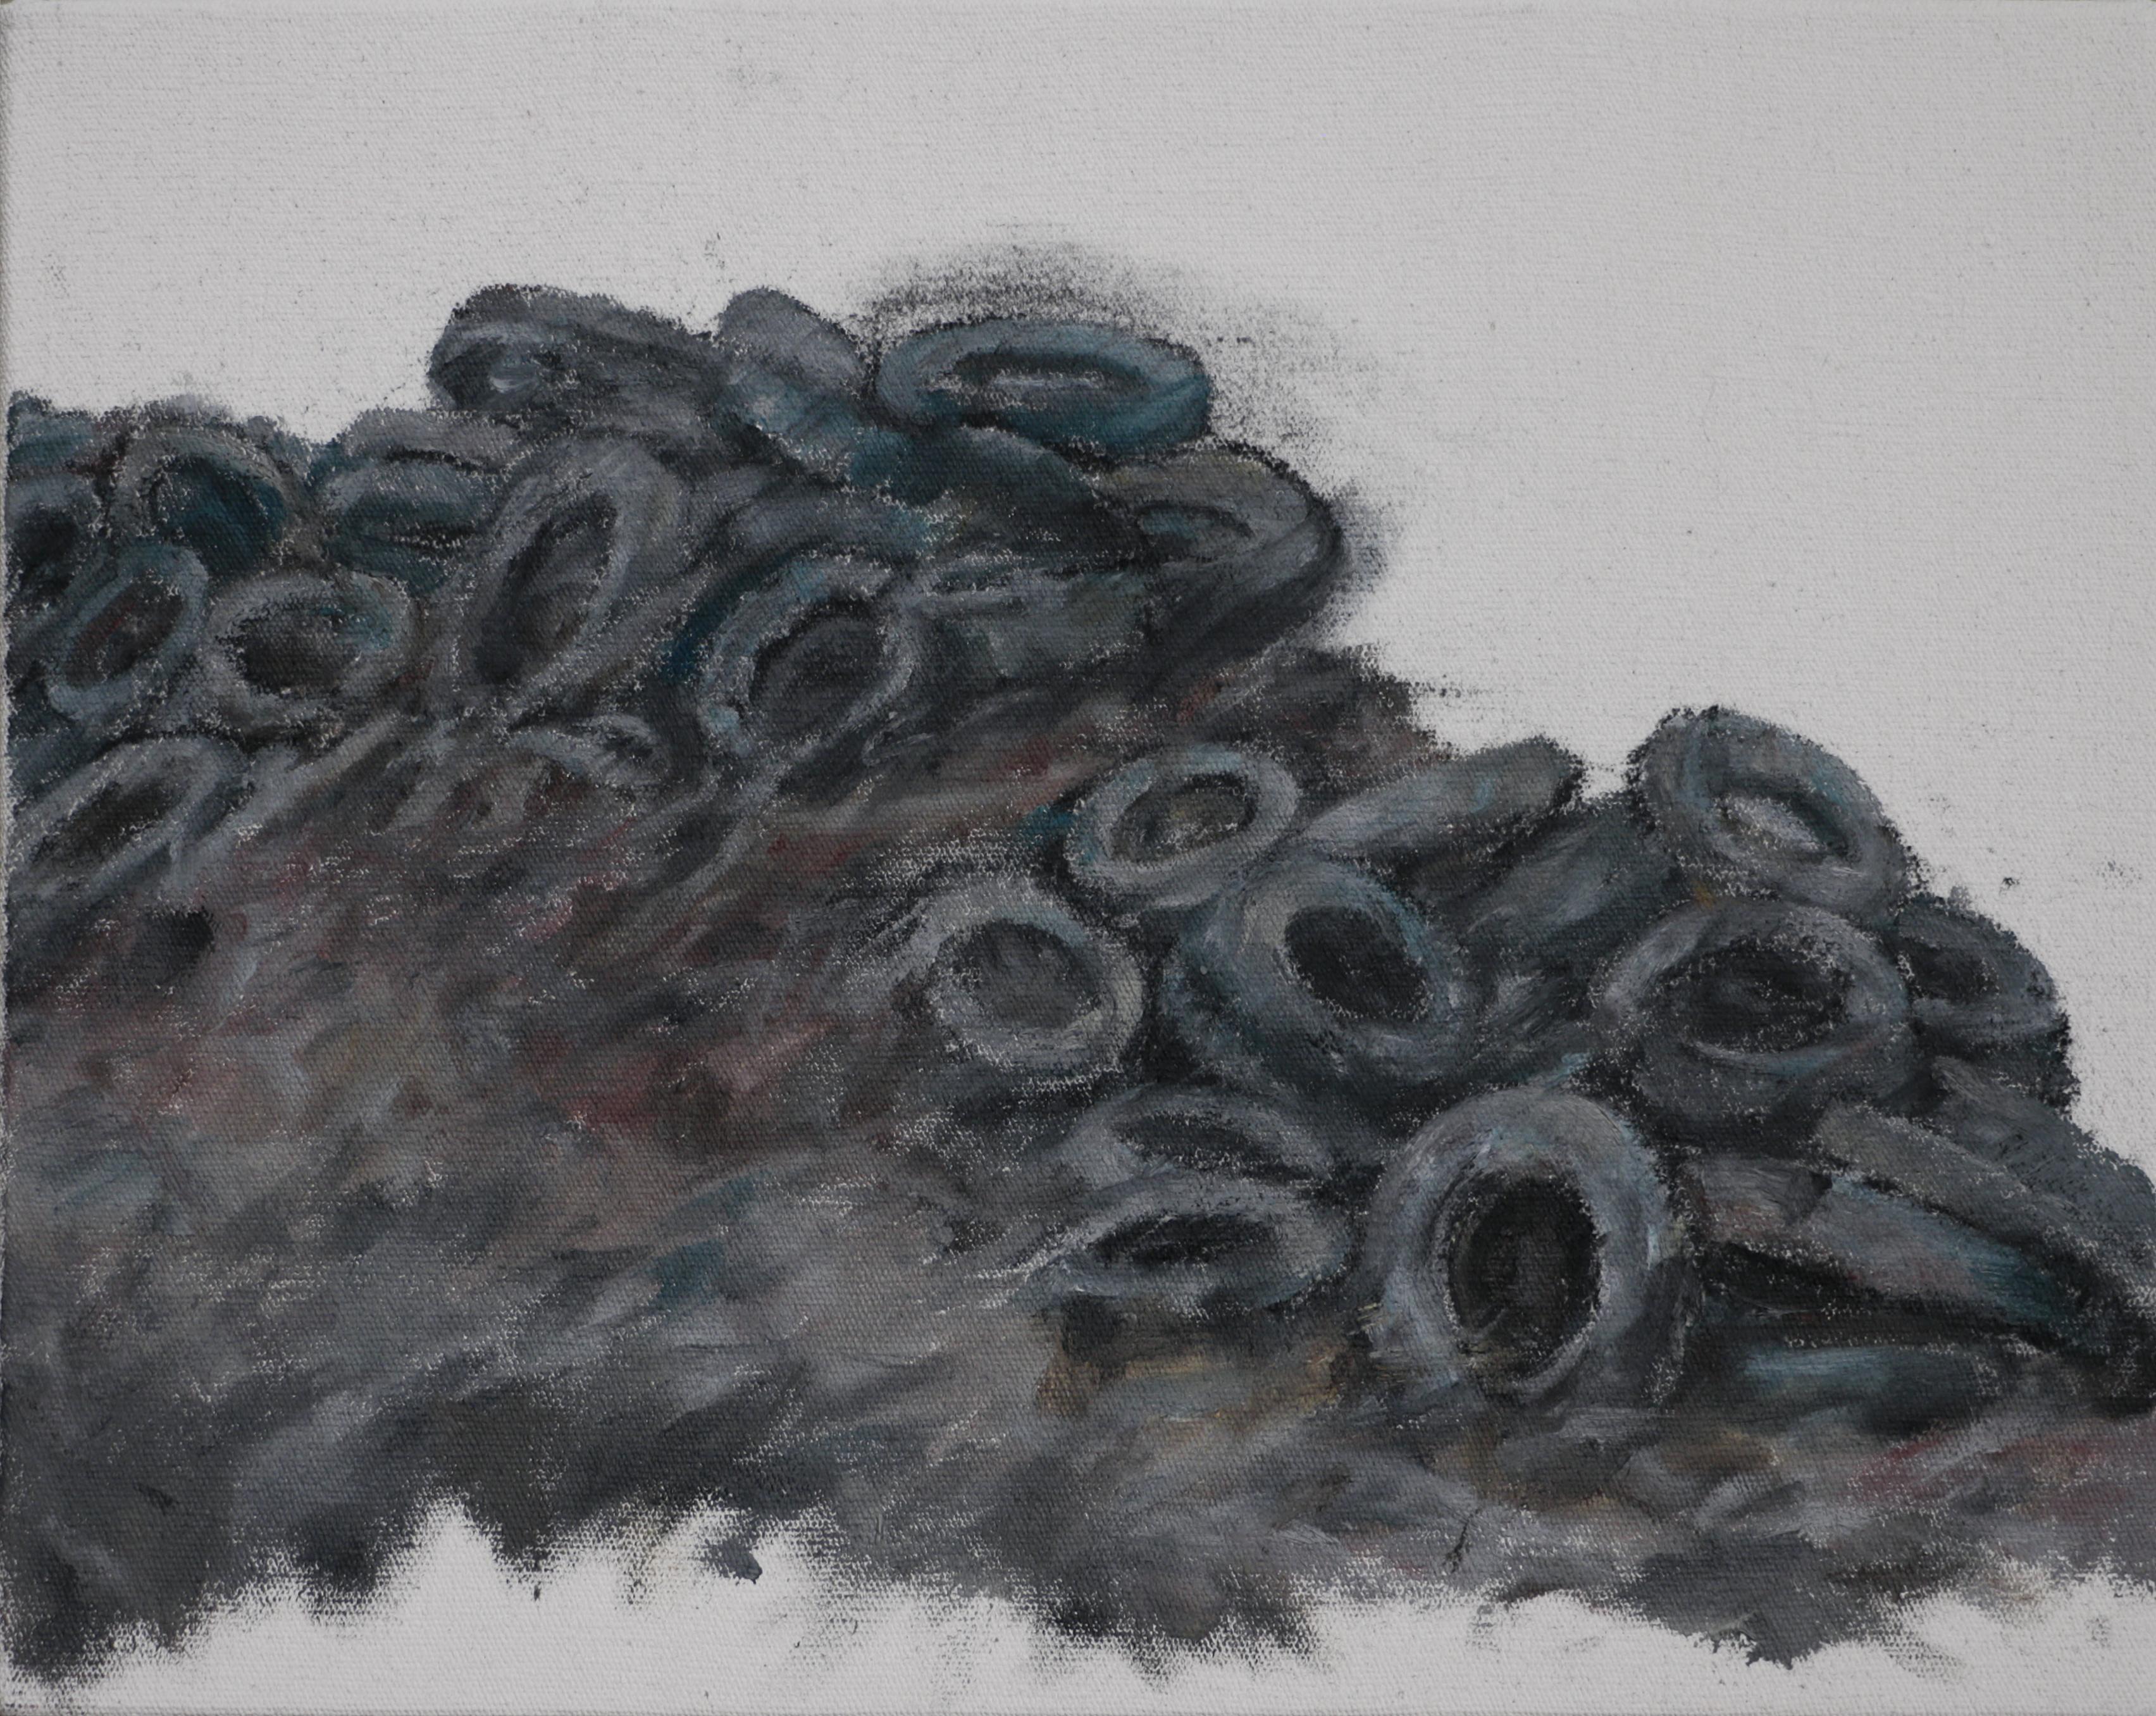 PNEUS, 2018, huile sur toile, 19 x 24 cm